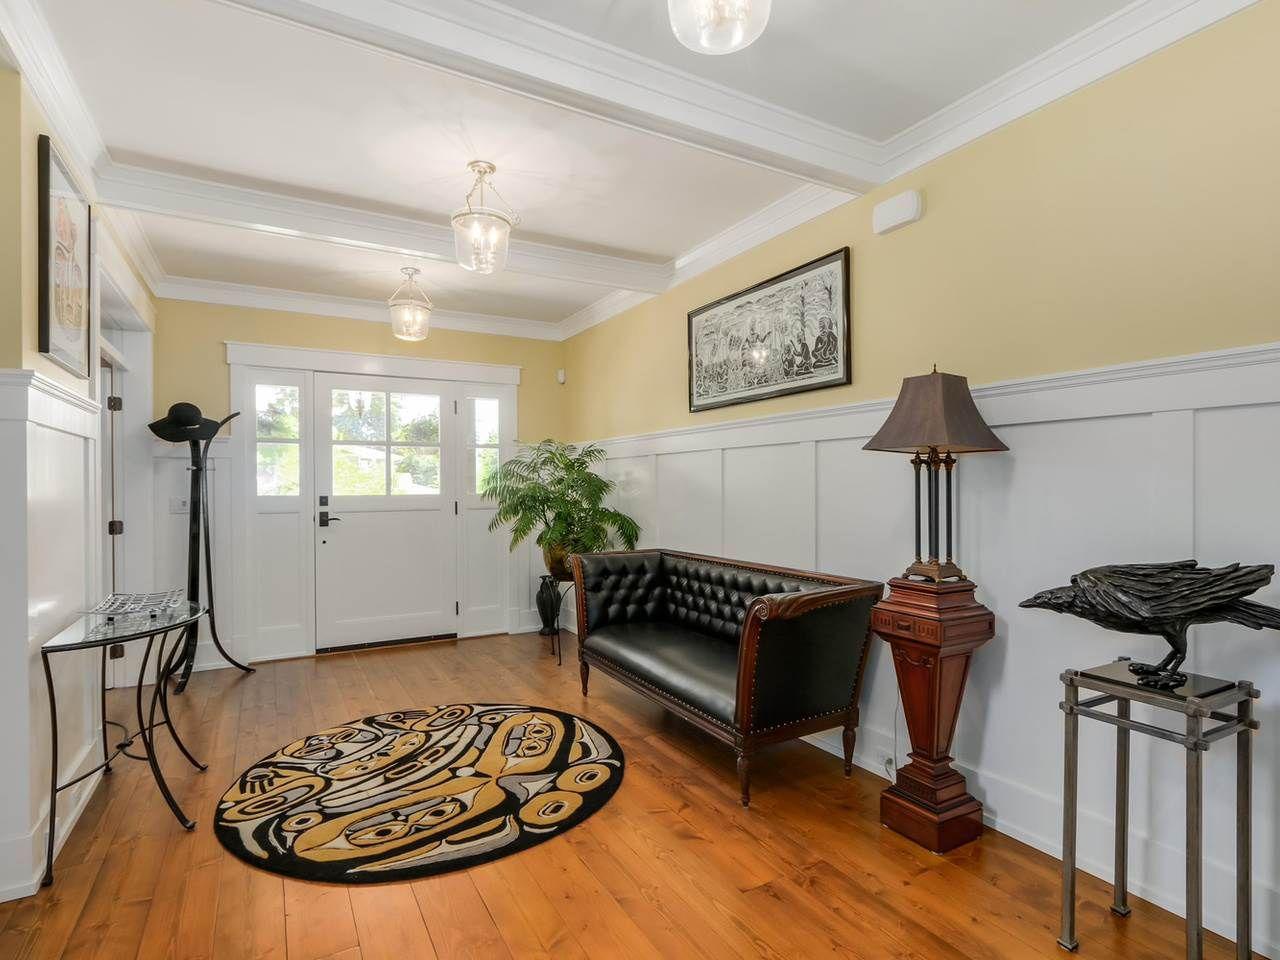 Photo 2: Photos: 13029 14 Avenue in Surrey: Crescent Bch Ocean Pk. House for sale (South Surrey White Rock)  : MLS®# R2070160